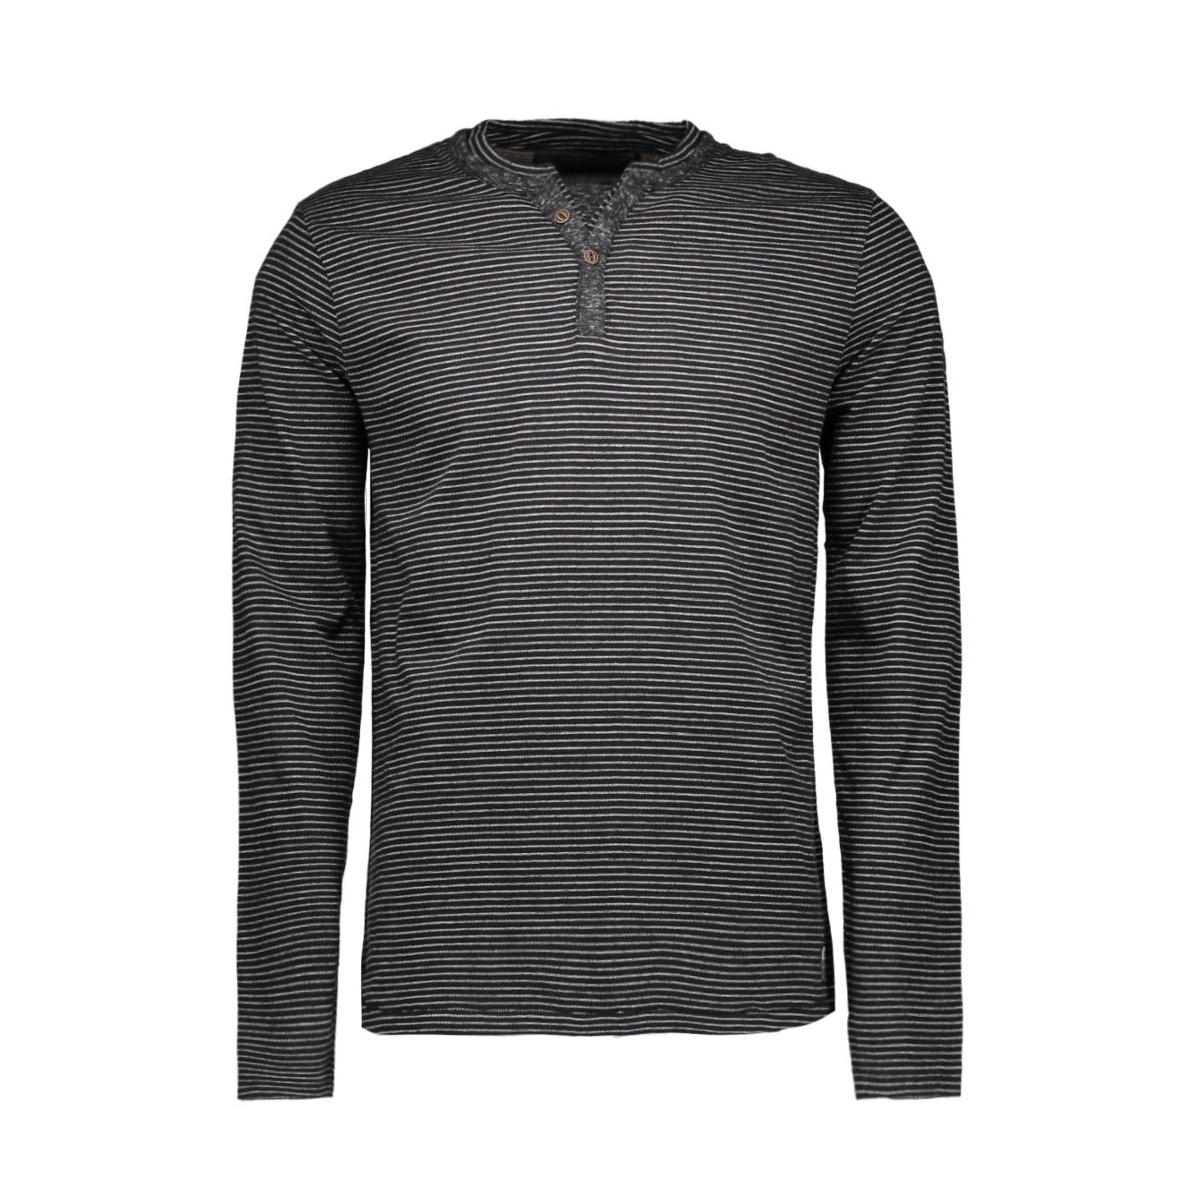 78150807 no-excess t-shirt 020 black